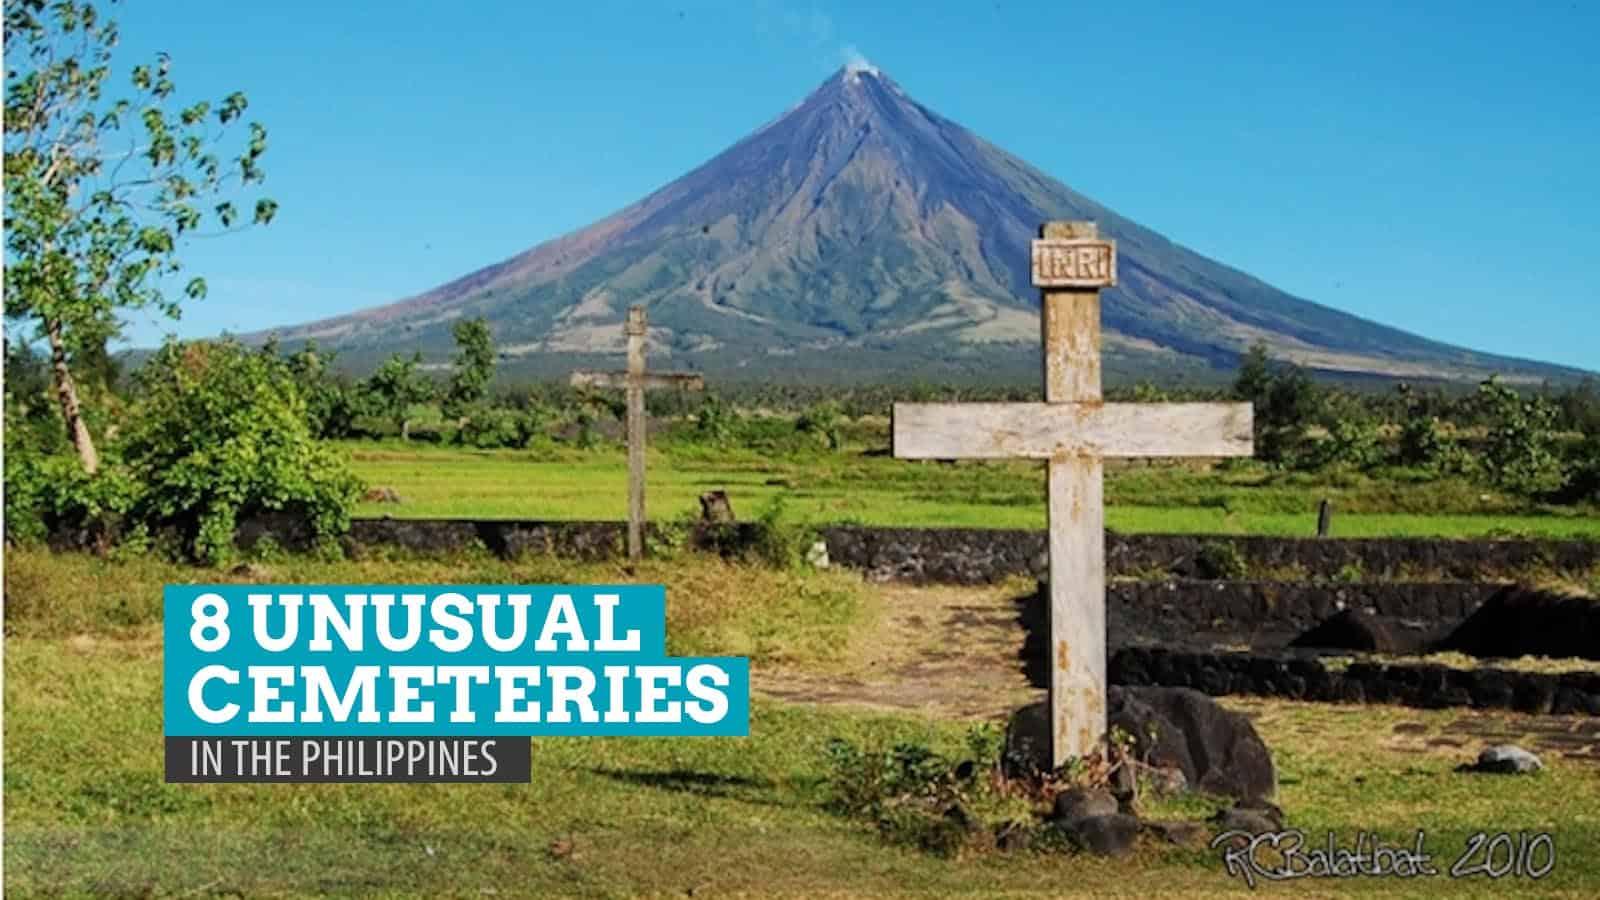 Unusual Cemeteries